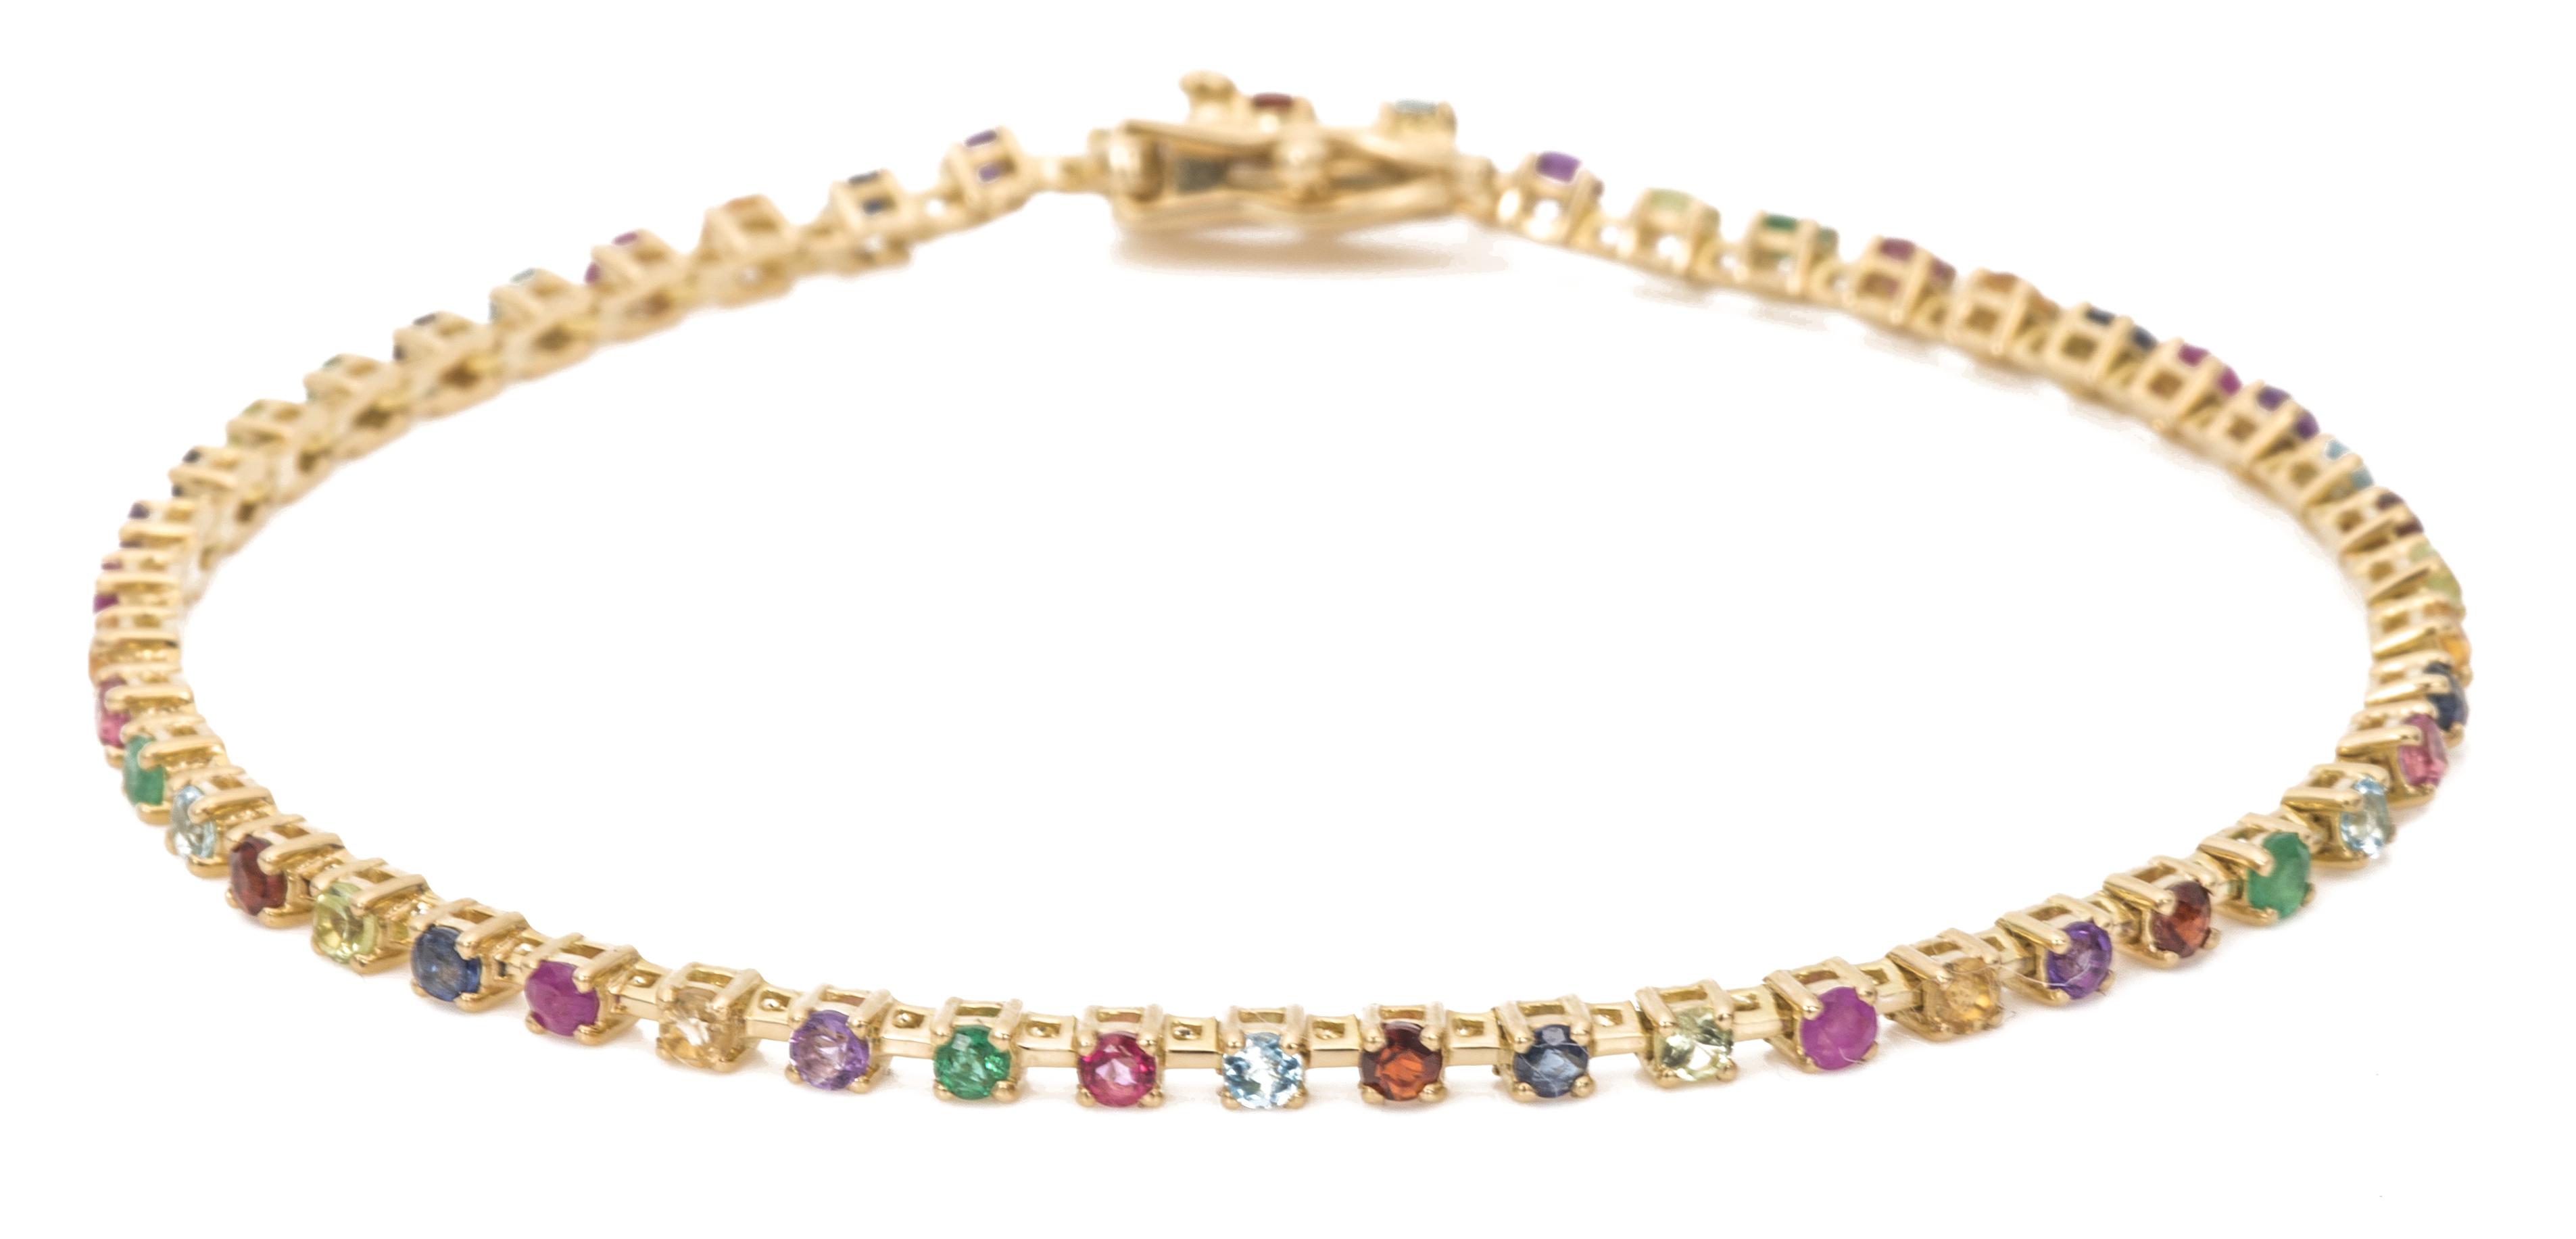 Ariel Gordon Candy Crush tennis bracelet | JCK On Your Market